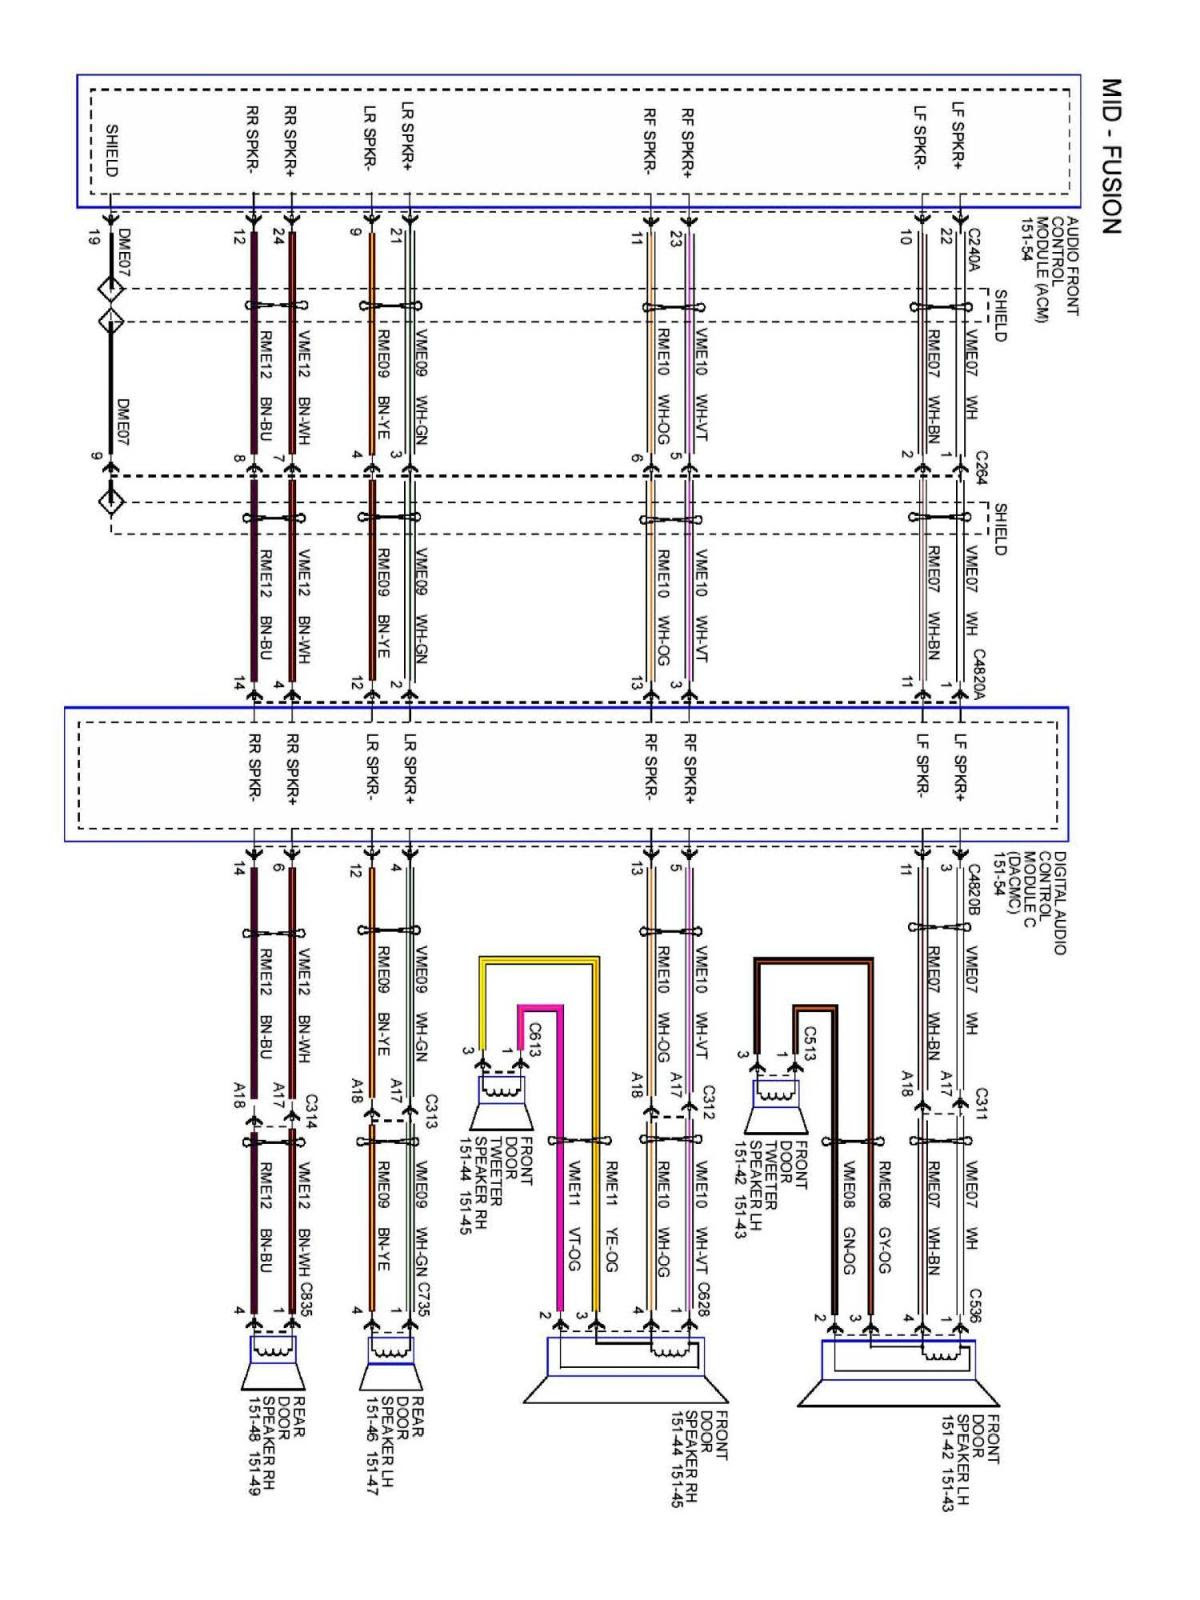 Ab Wiring Diagram 2008 Ford Fusion